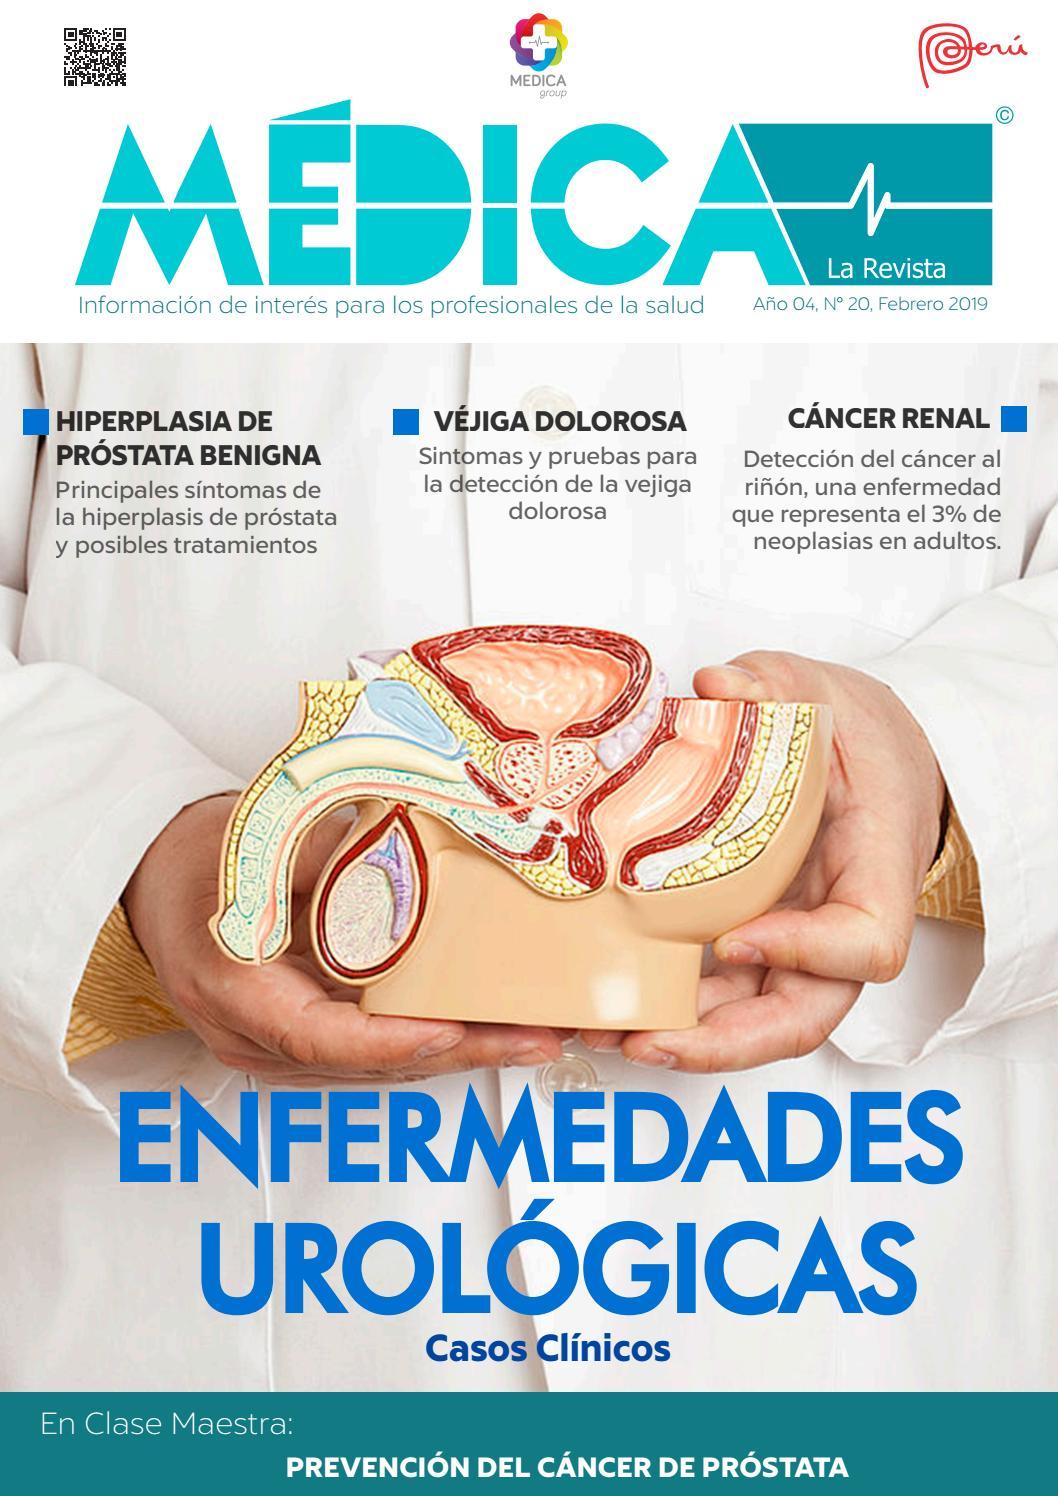 medicina 33 enfermedades de la próstata